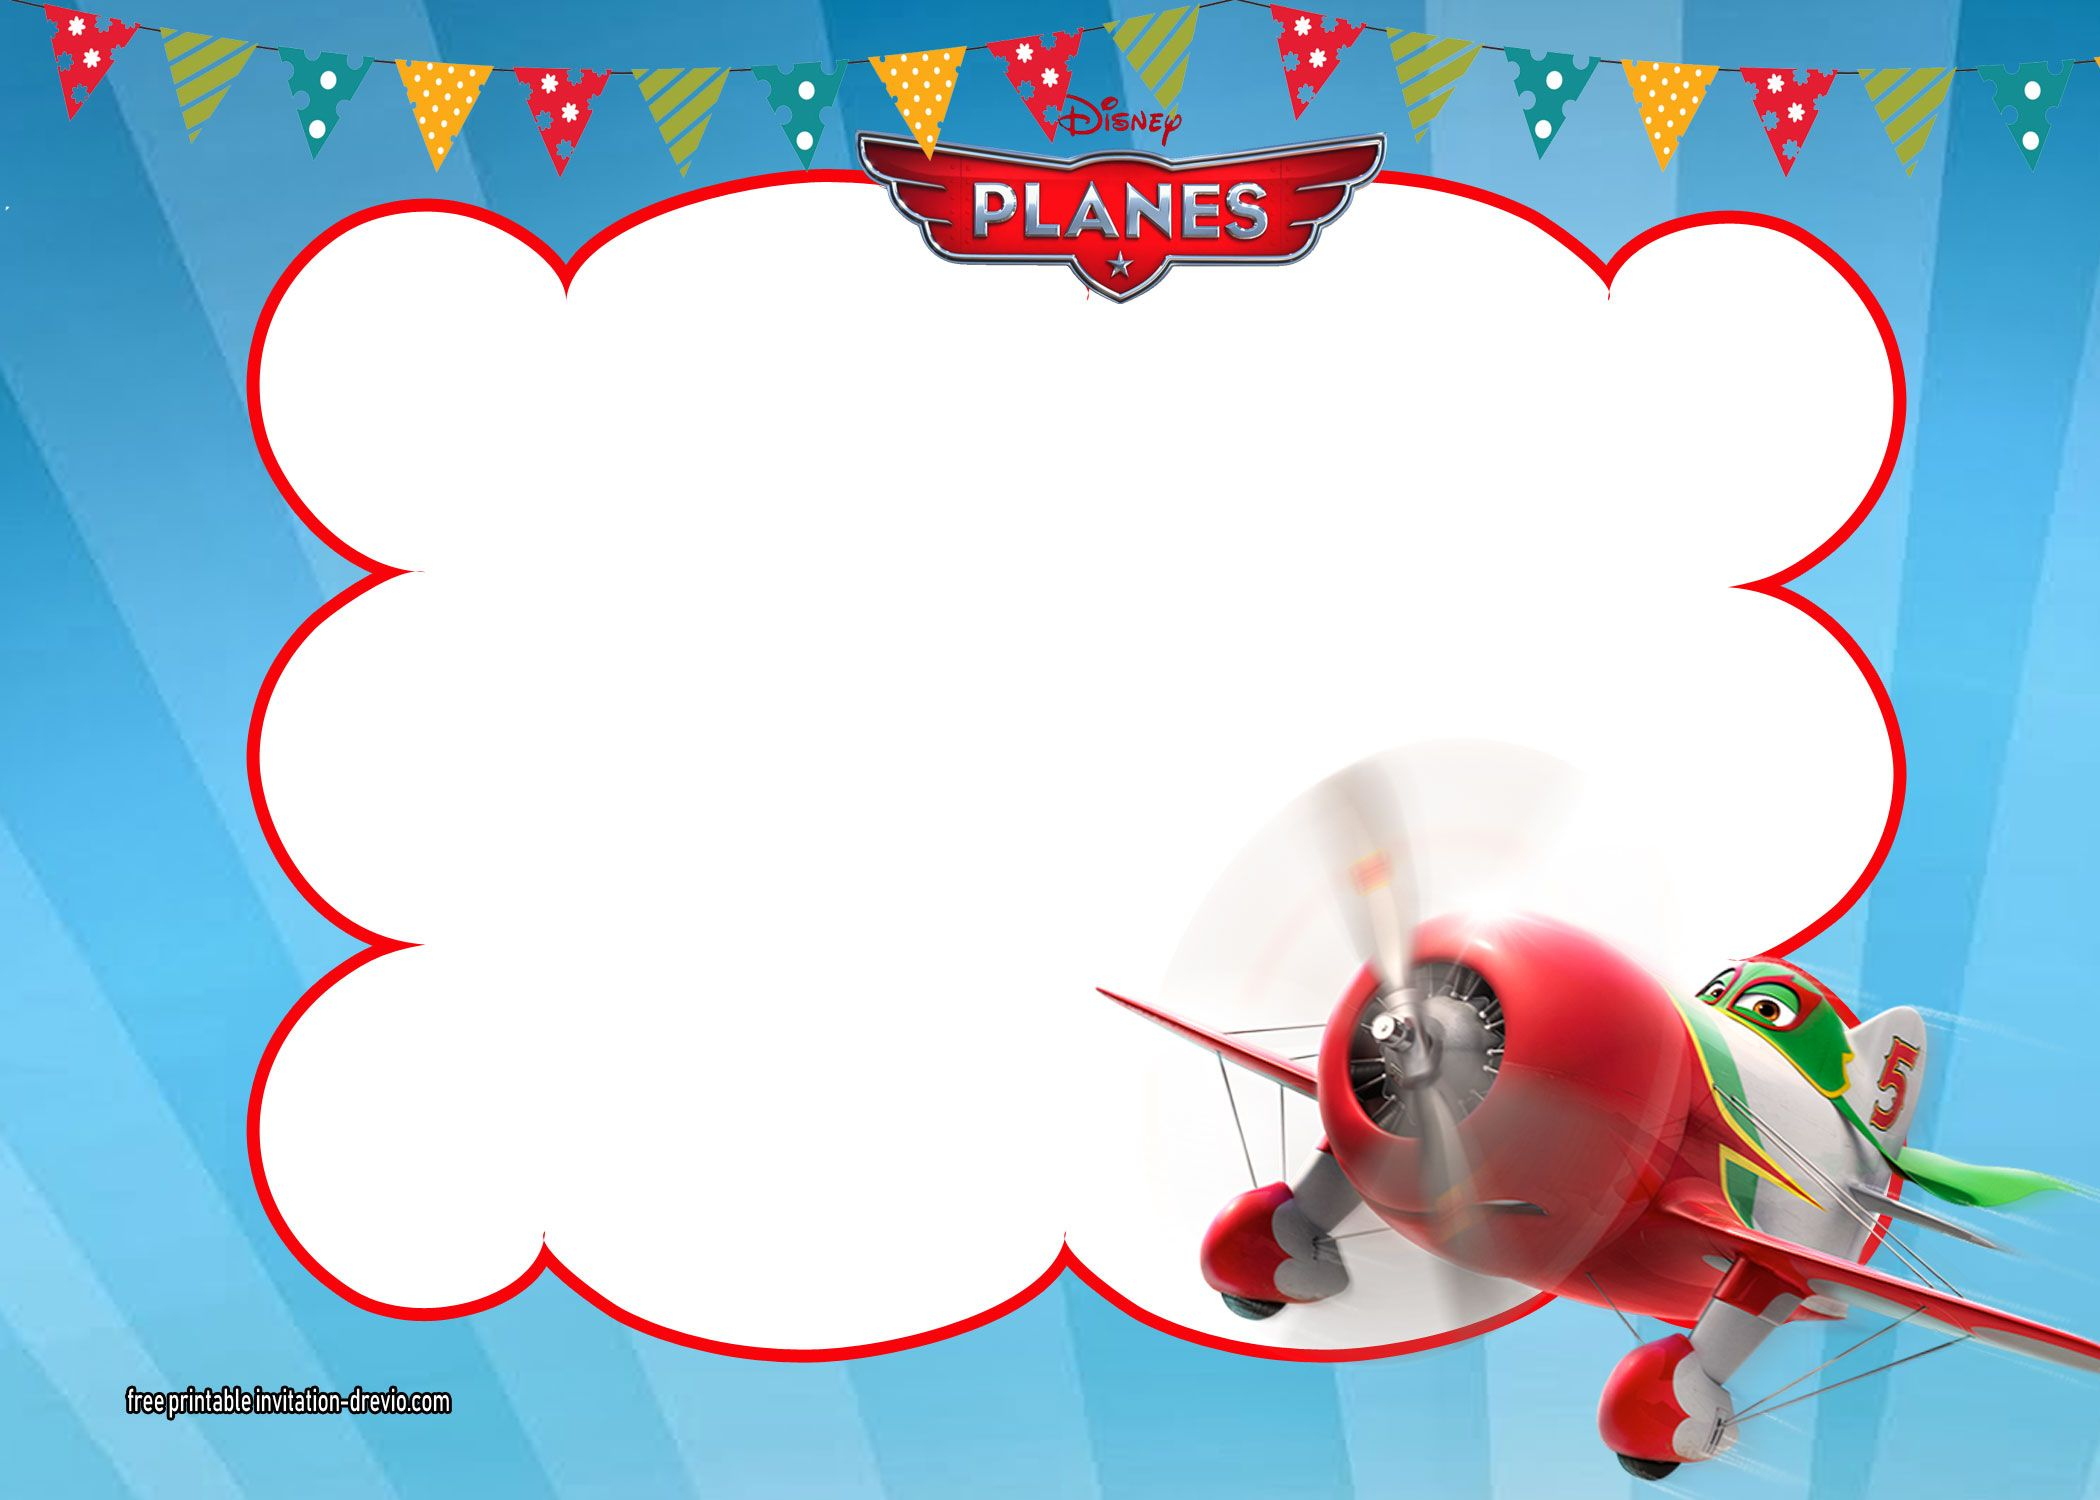 photograph regarding Free Printable Birthday Invitation Templates identified as Disney Planes Birthday Invitation Template Invitation